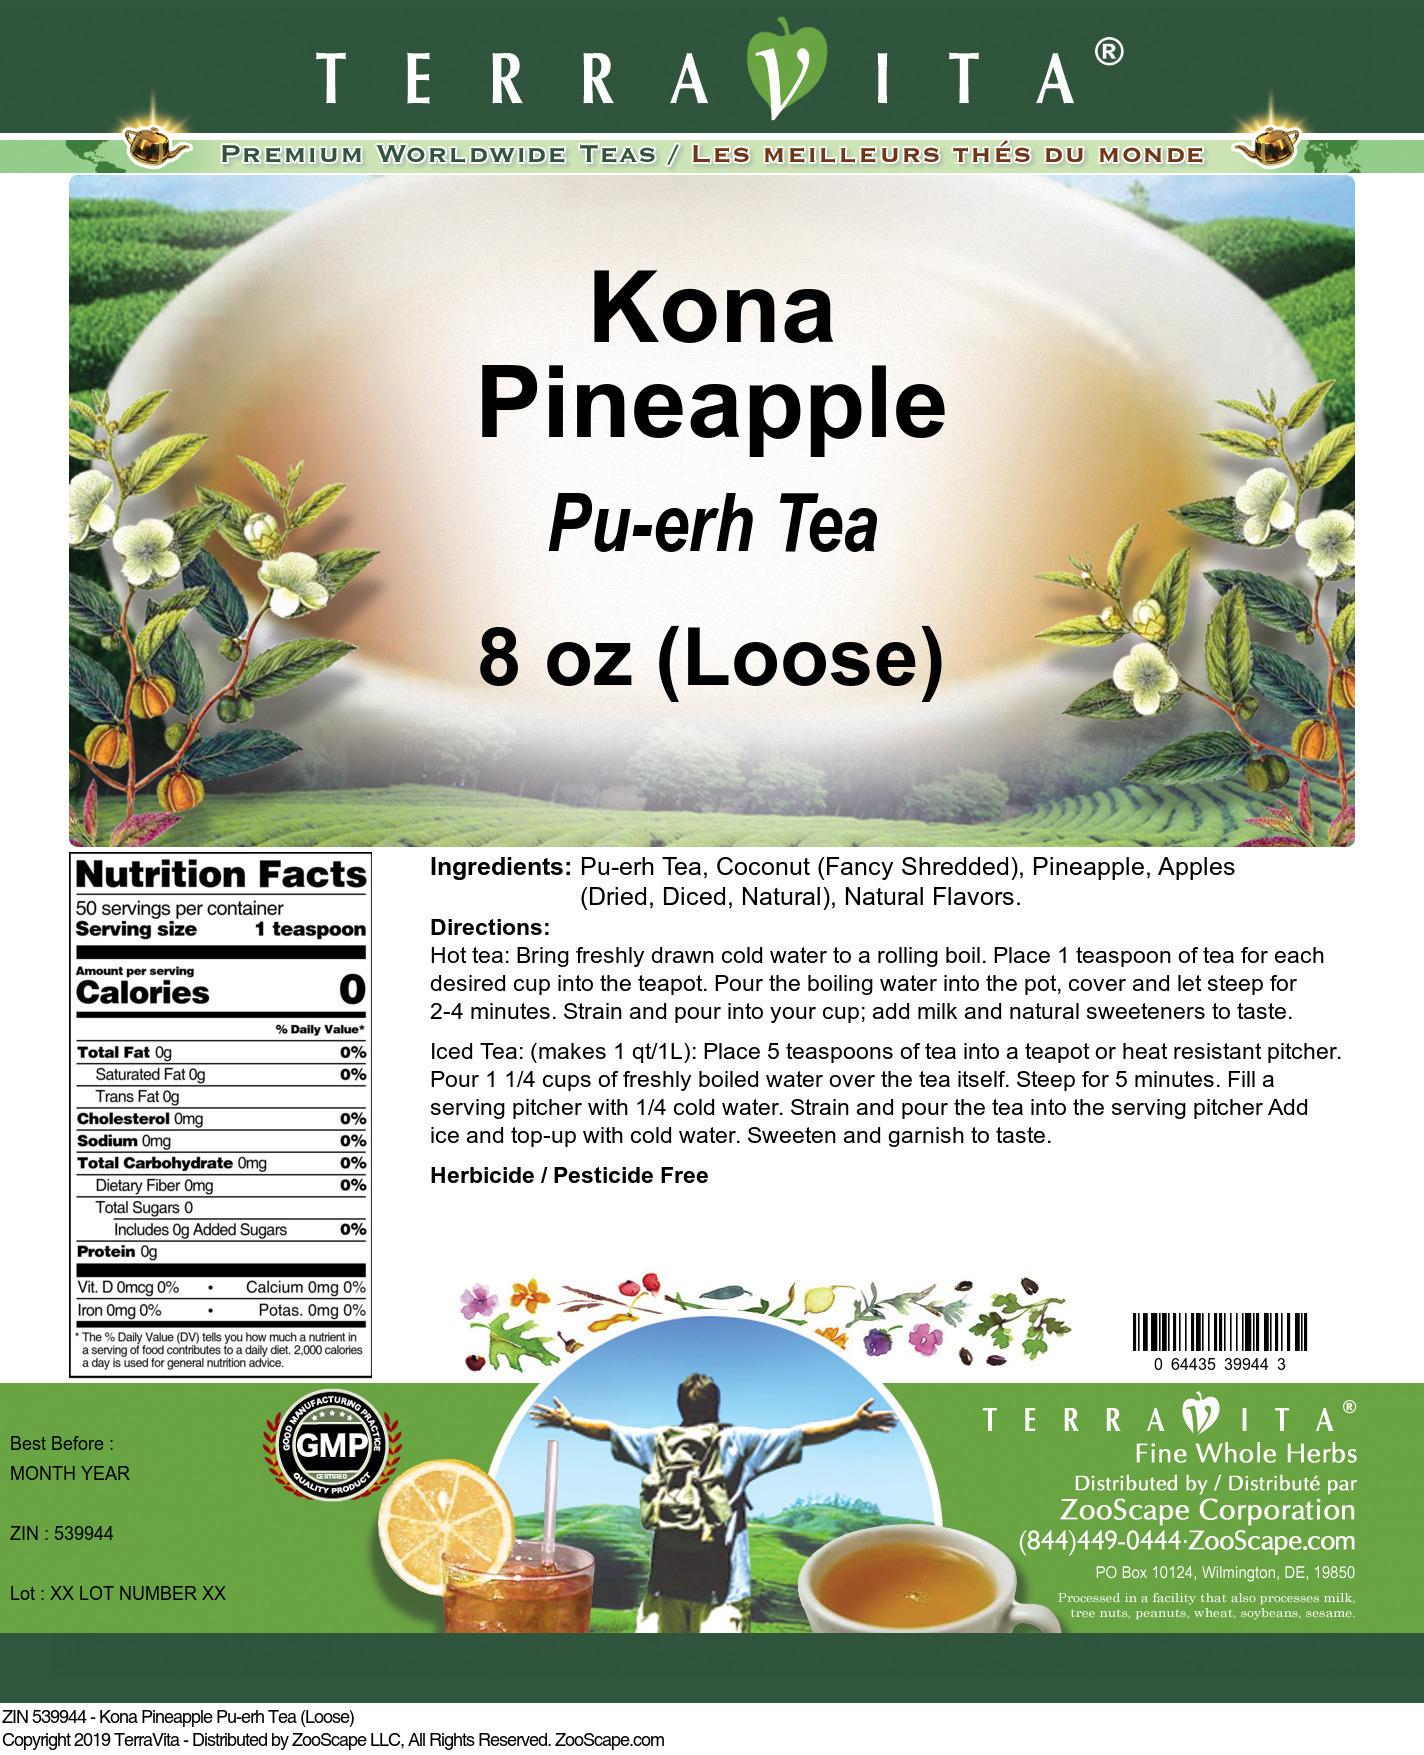 Kona Pineapple Pu-erh Tea (Loose)